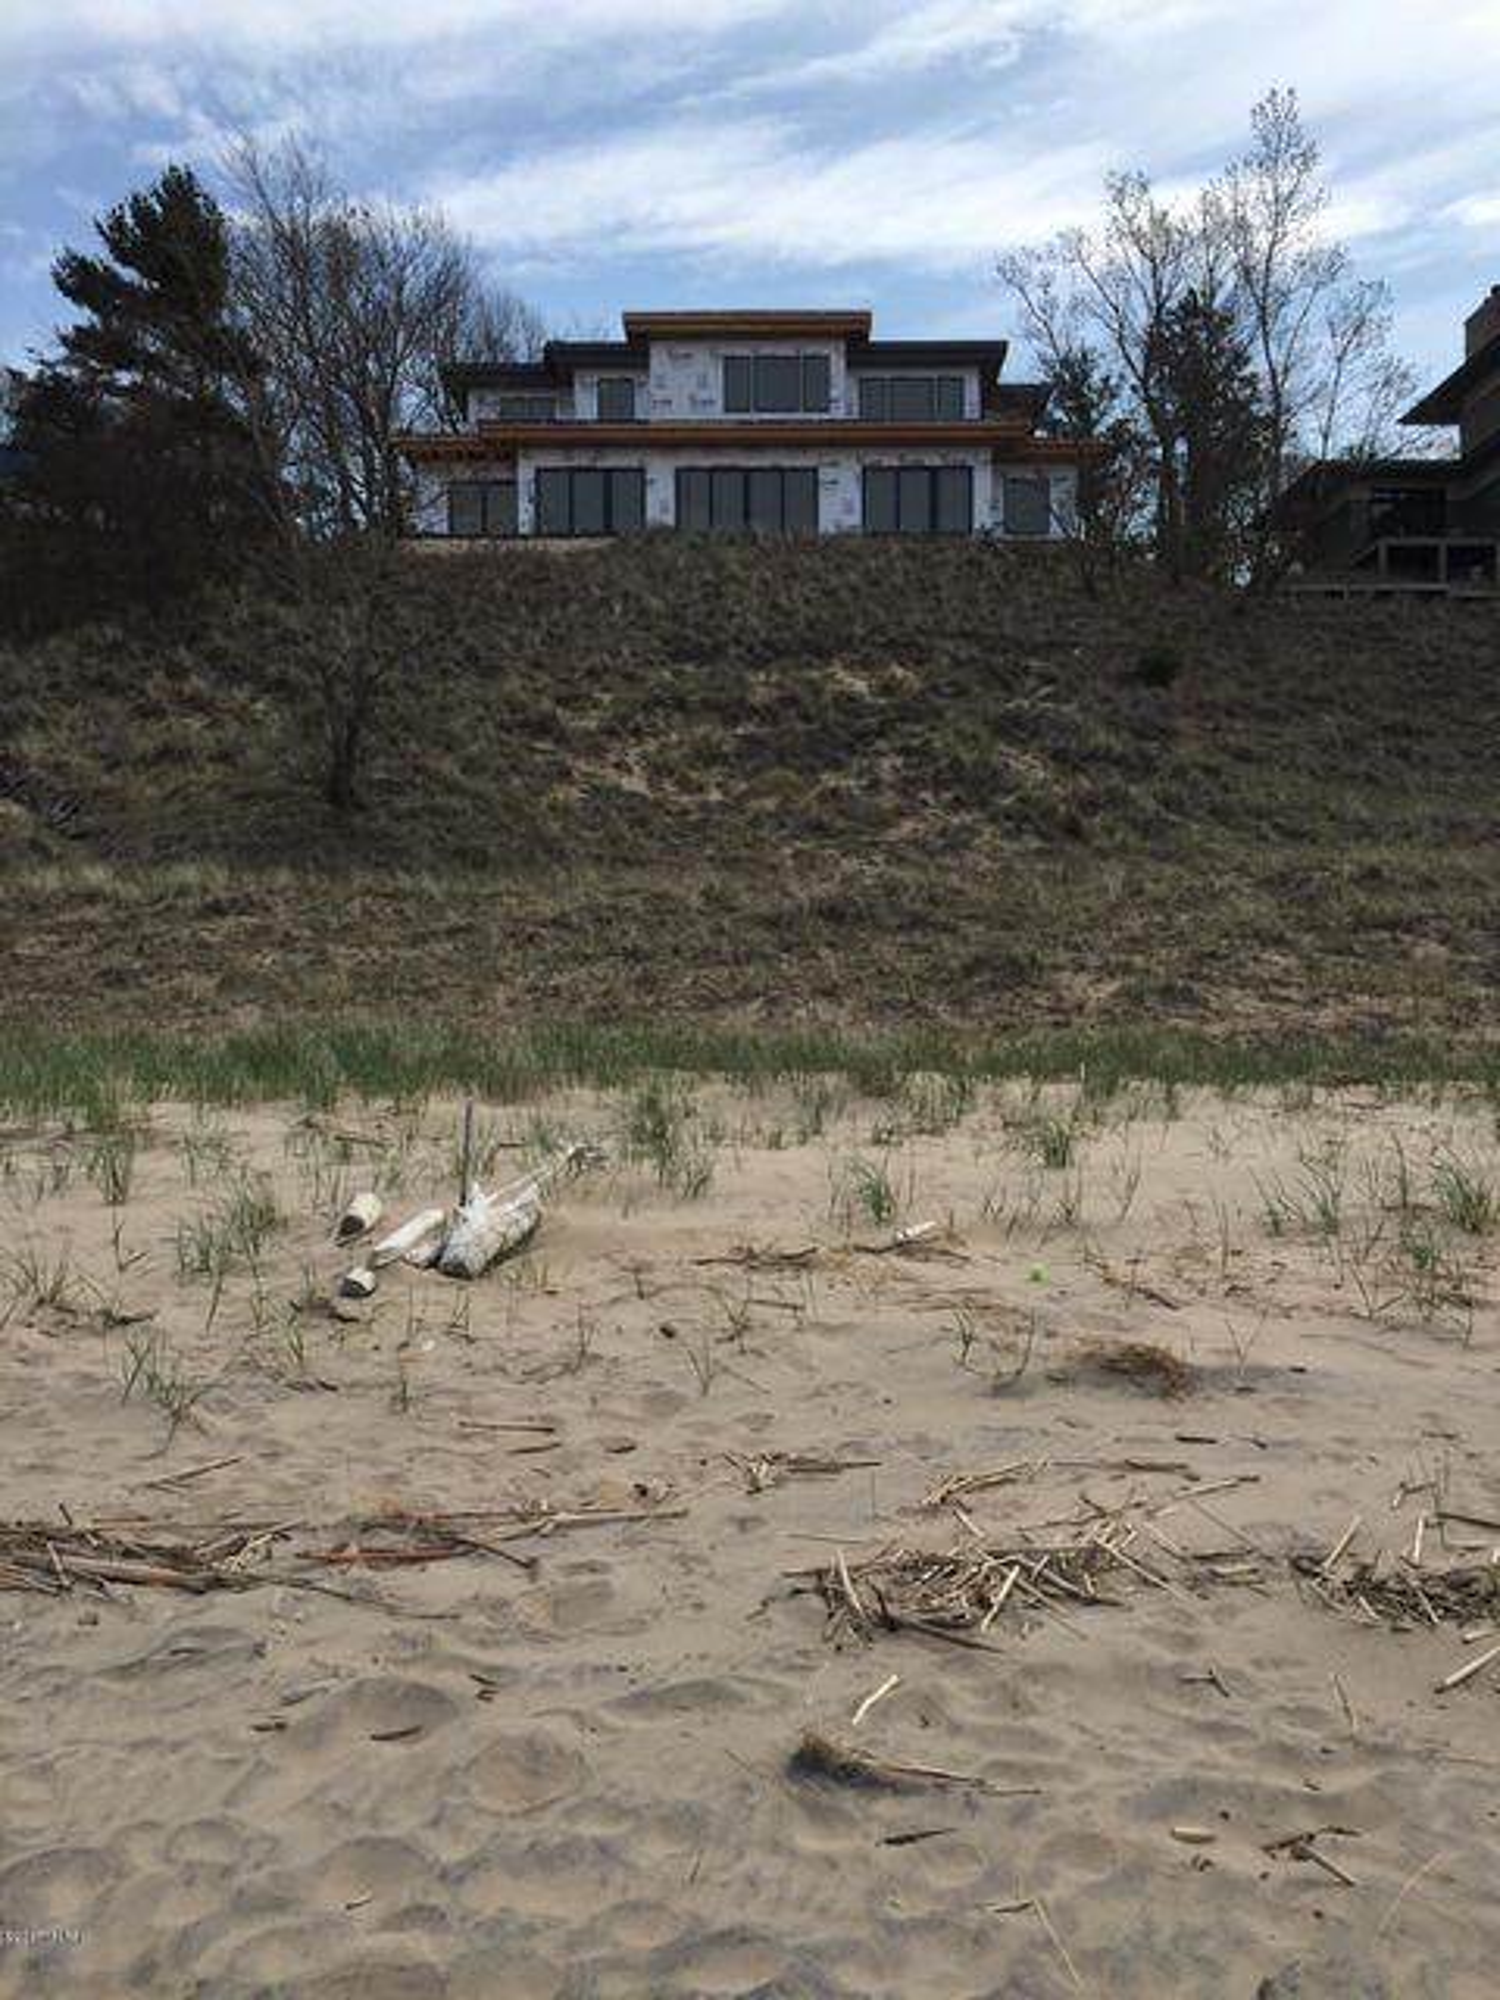 Single Family Home for Sale at 17583 North Shore Estates Ferrysburg, Michigan 49409 United States